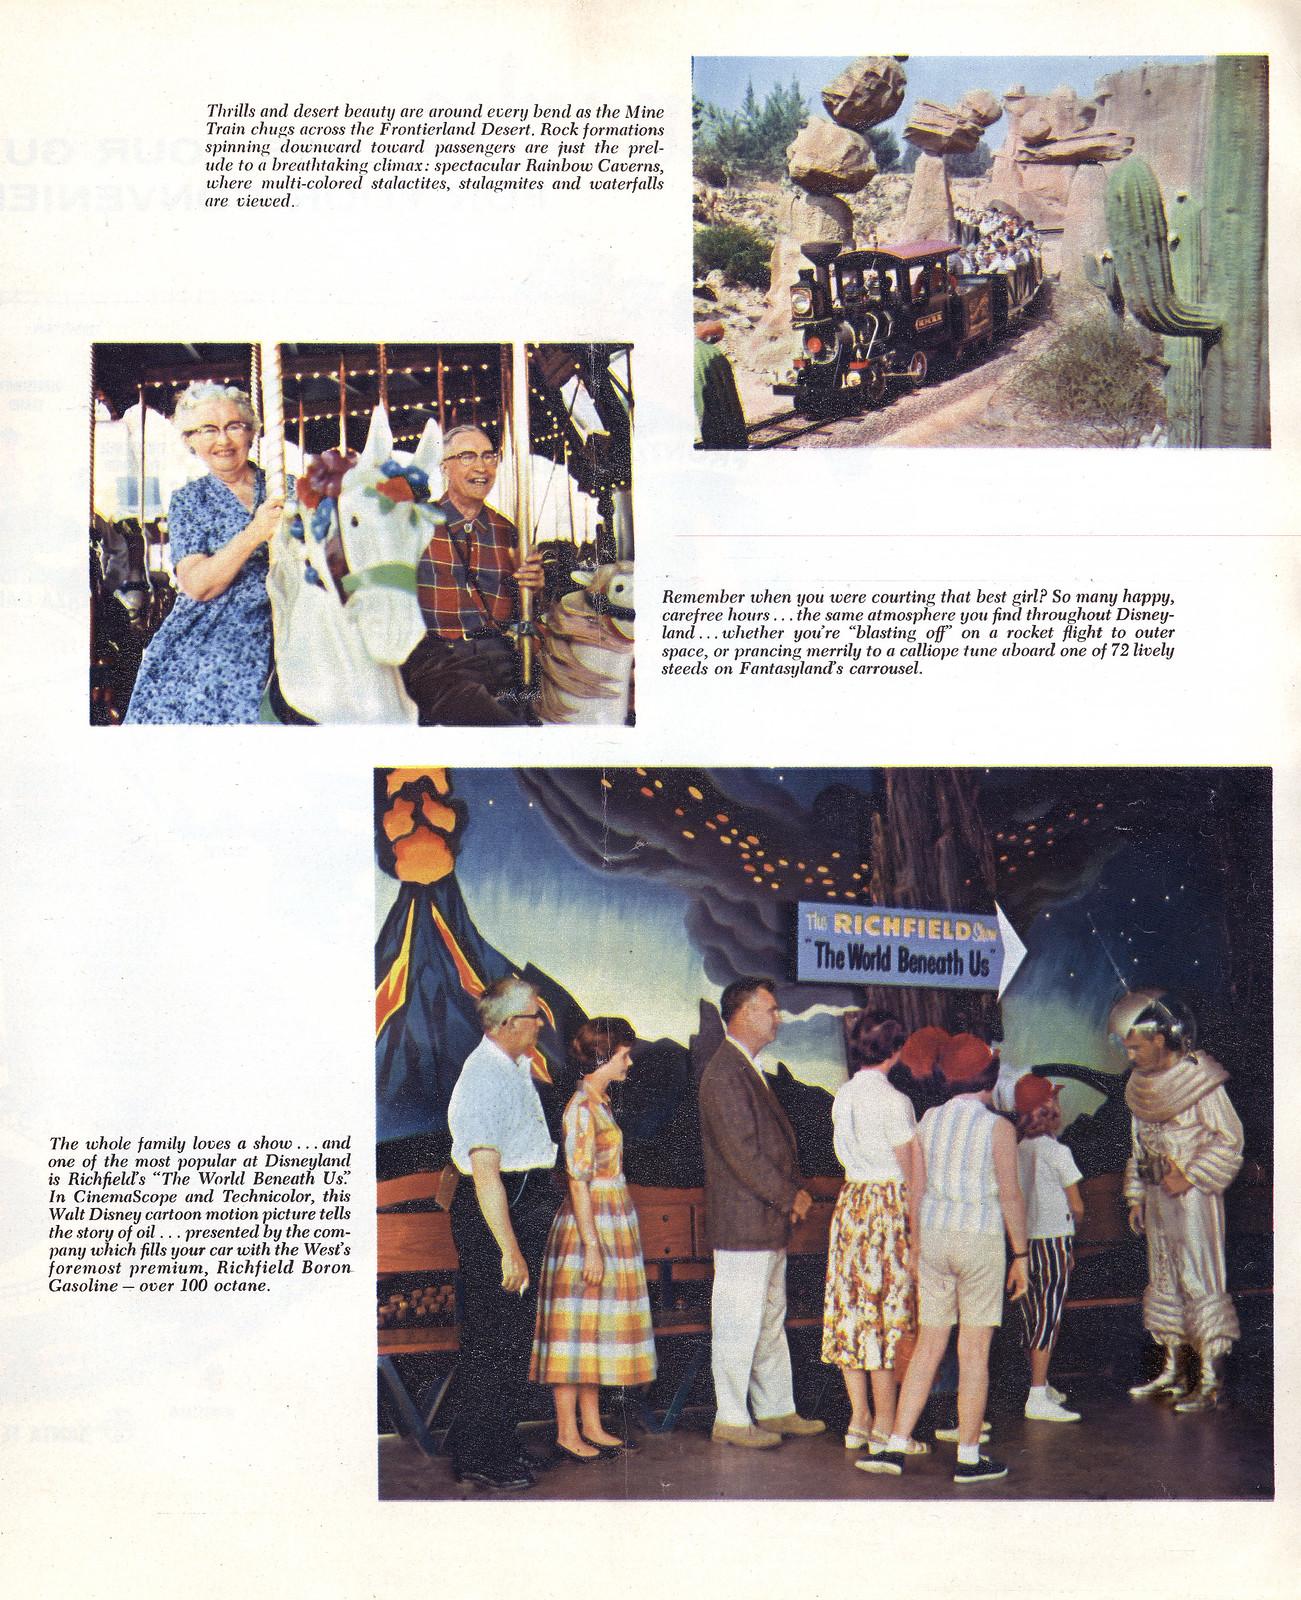 1959 Disneyland Summer Newspaper supplement 09 - Mine Train Through Nature's Wonderland, King Arthur's Carrousel, Richfield's The World Beneath Us